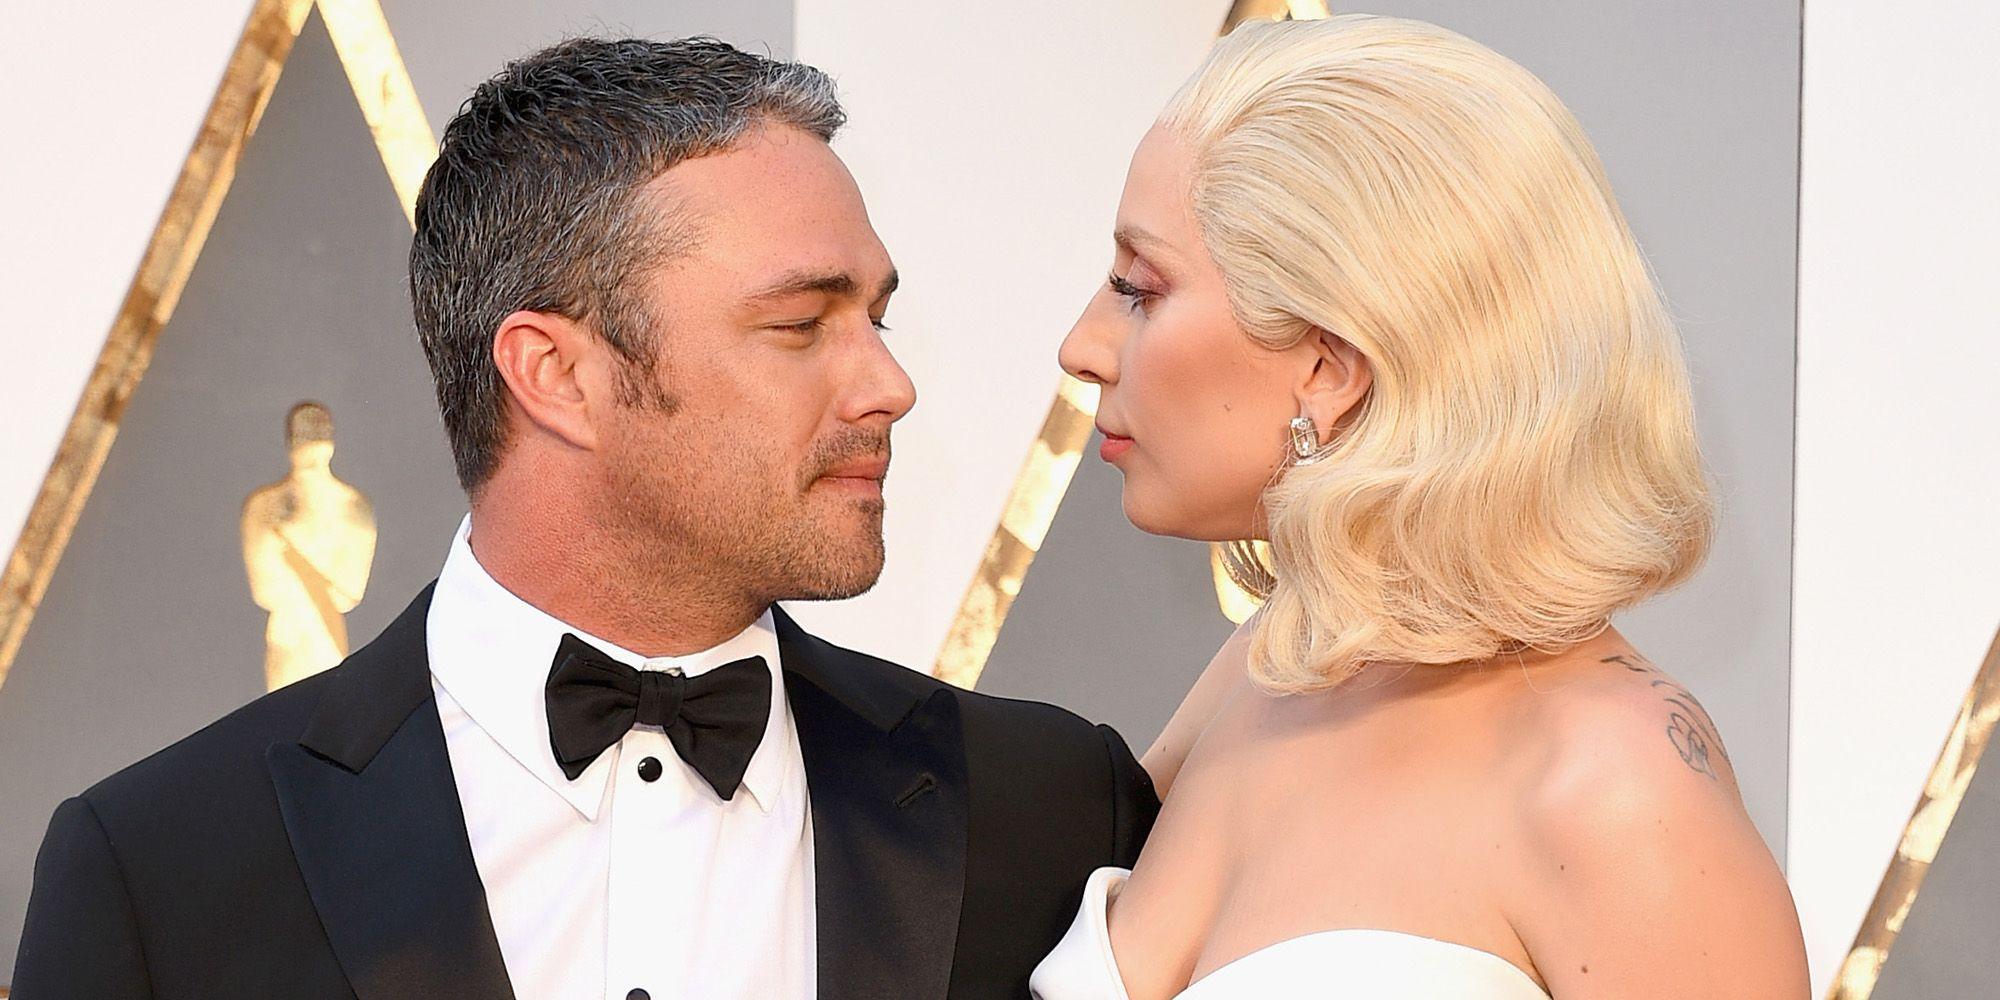 Lady Gaga Praises Taylor Kinney For Loving The Survivor In Me